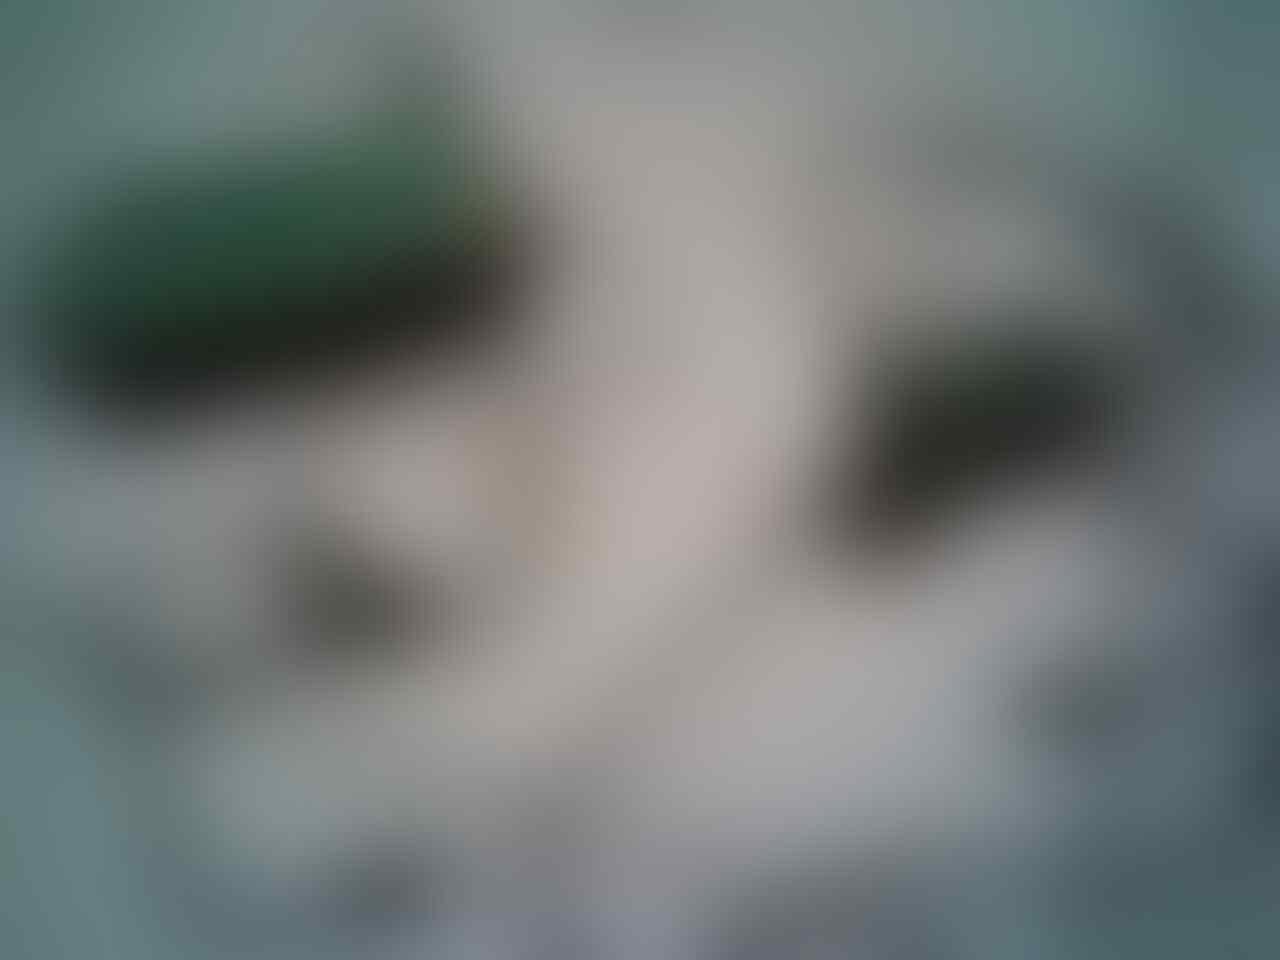 jual psp 3006 green second but good condition, BEKASI